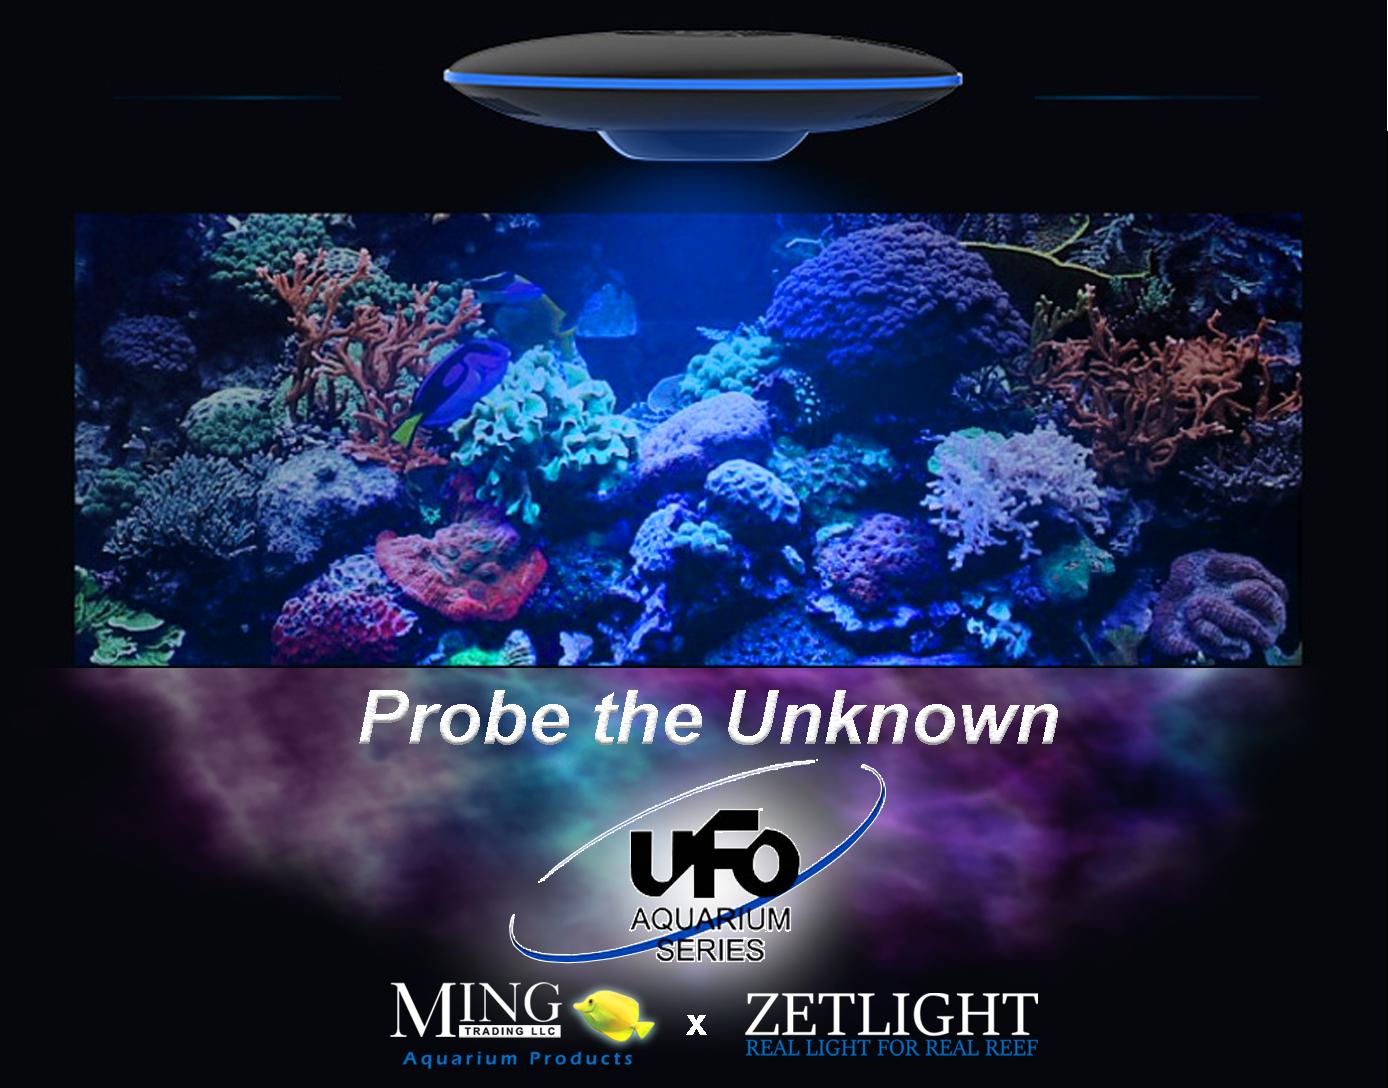 zetlight ufo ming